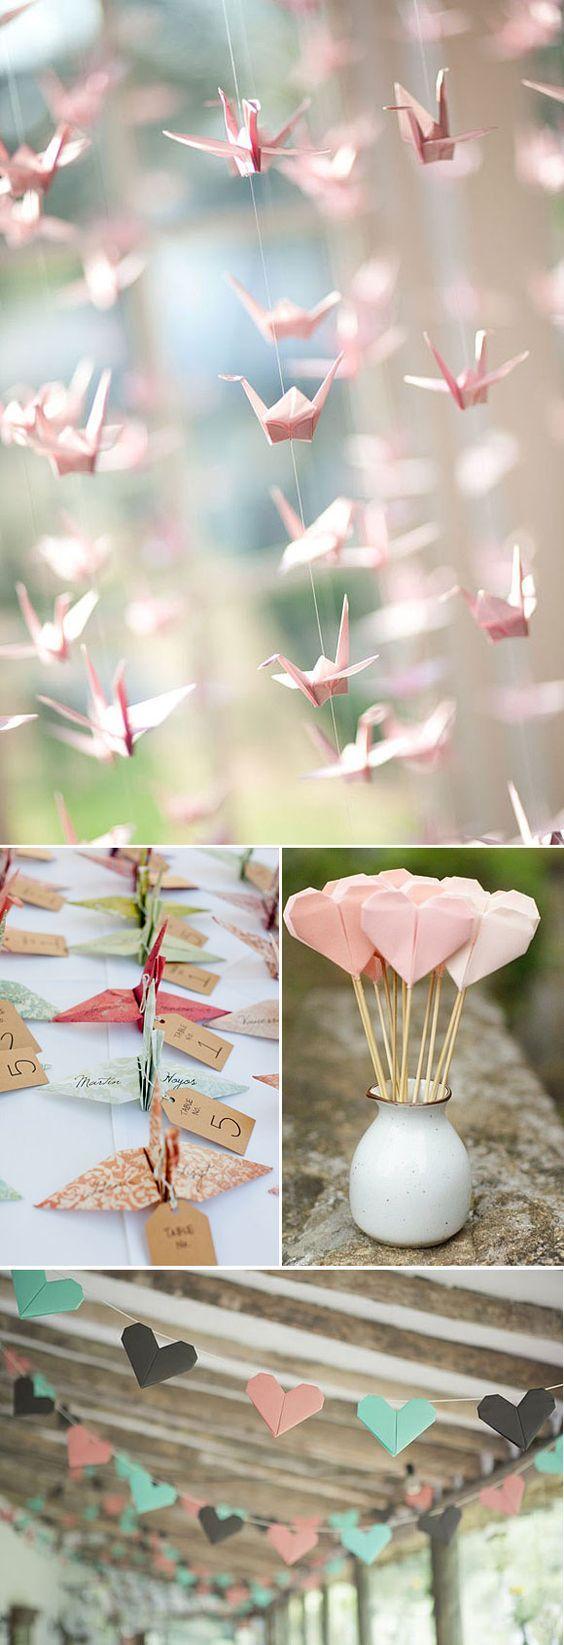 Origami para decorar tu boda: